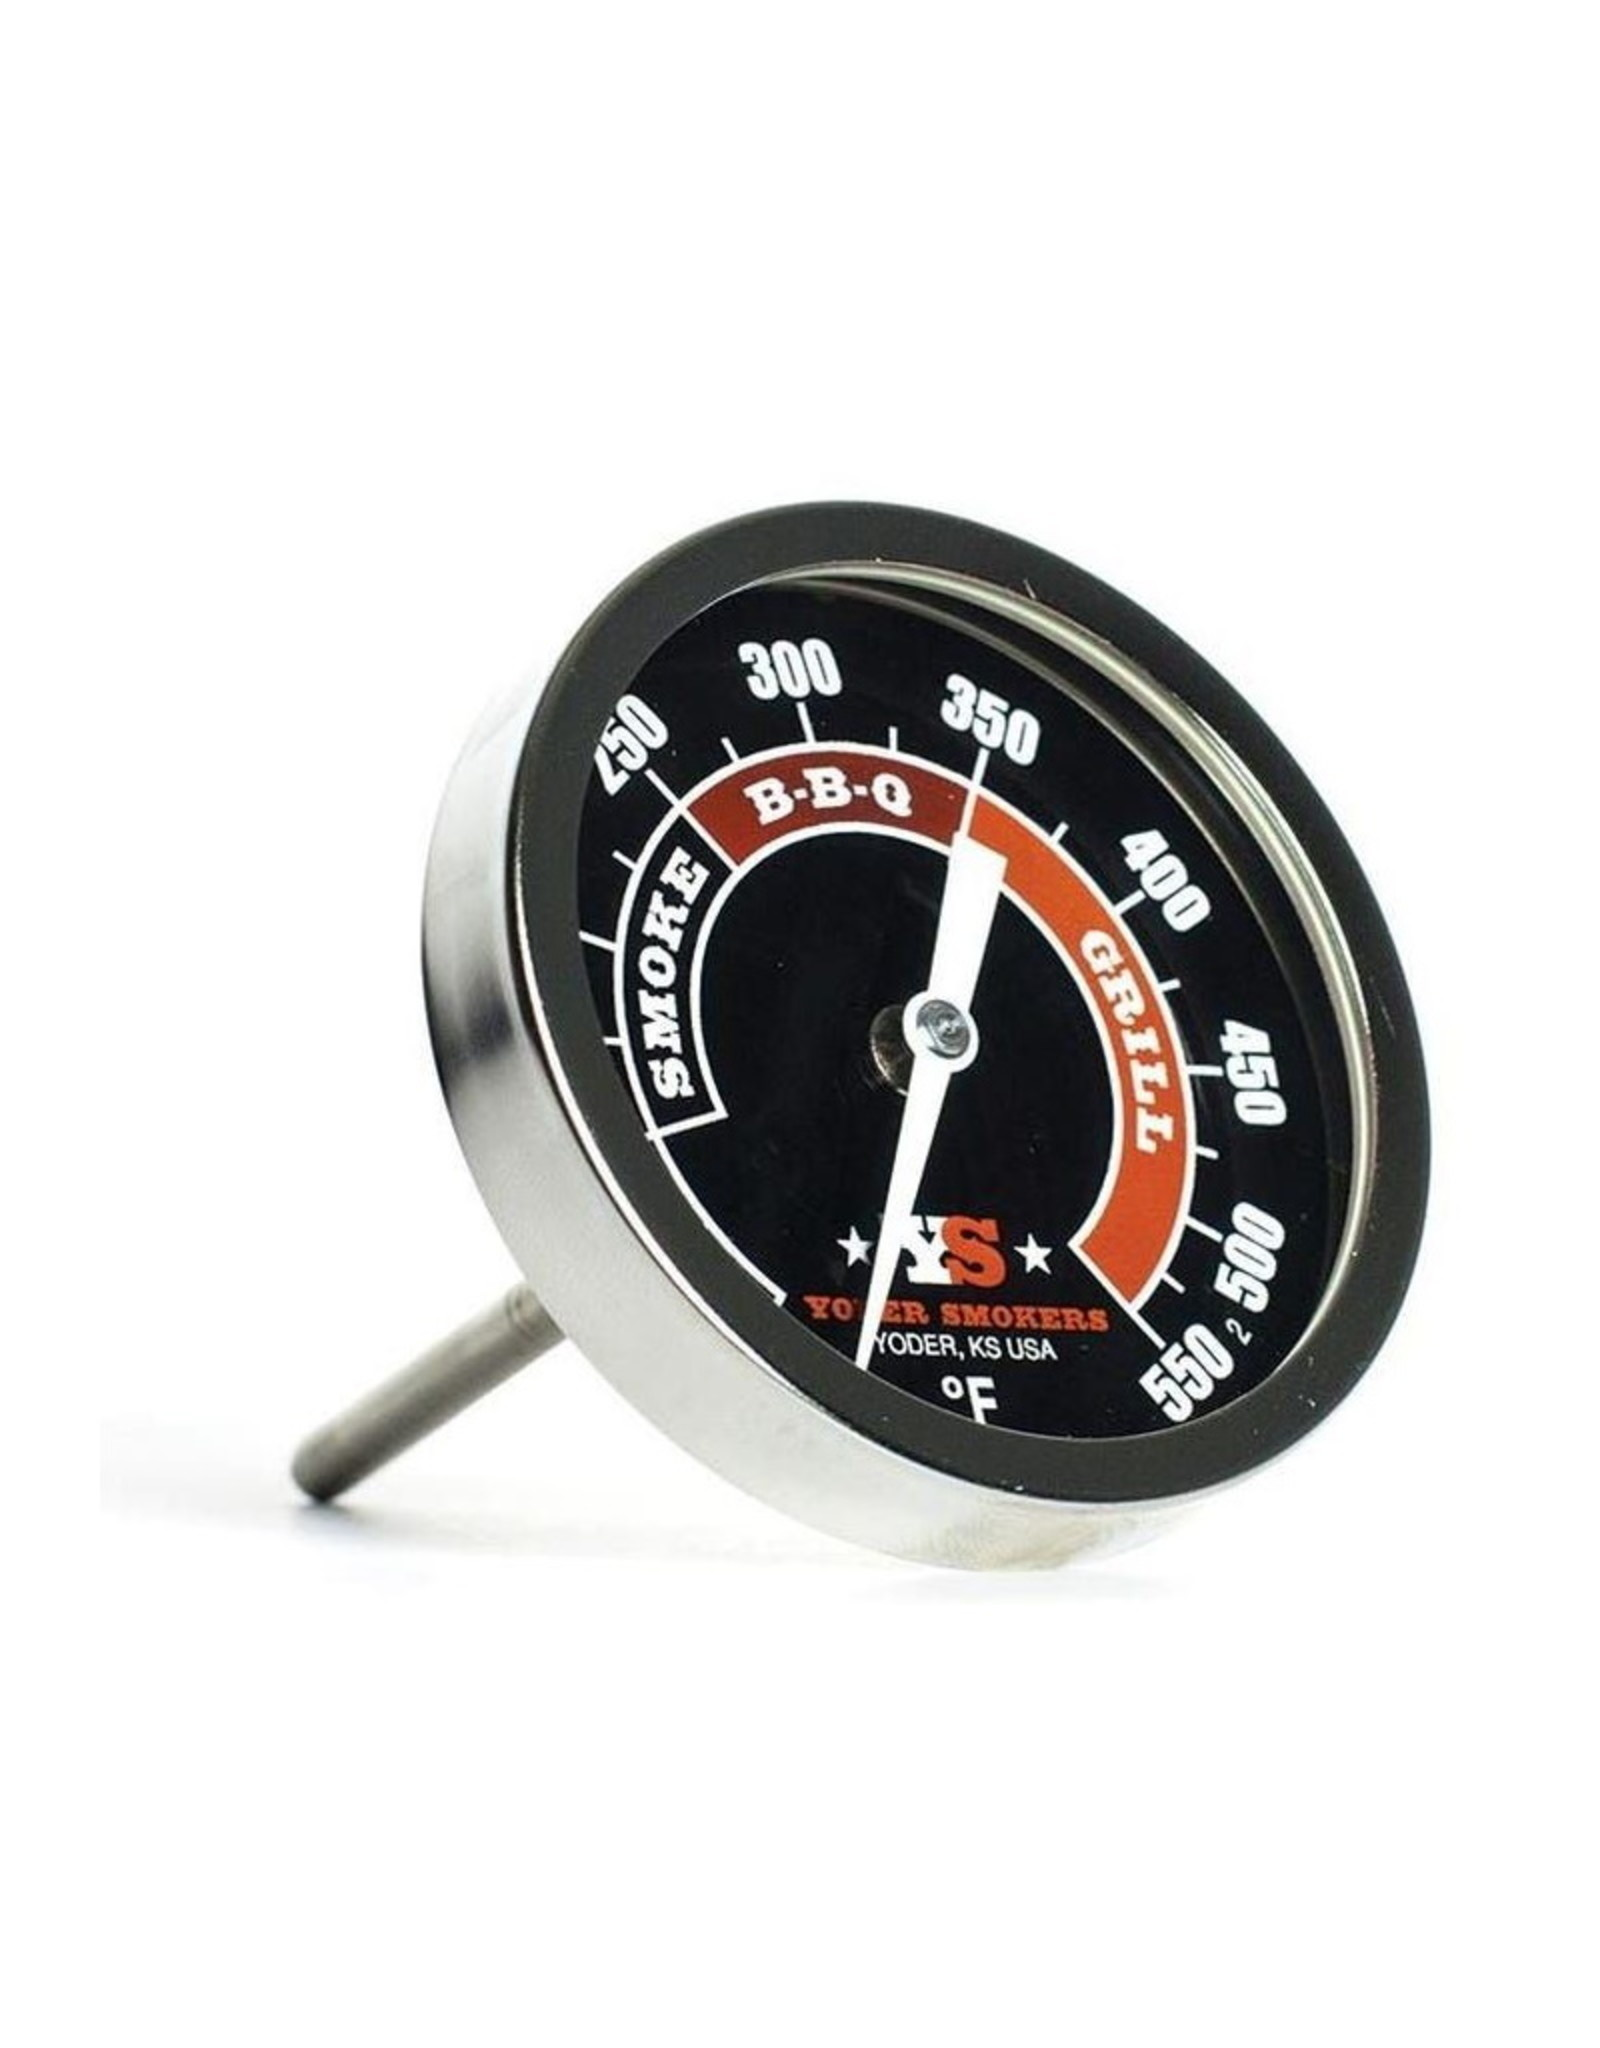 Yoder Smokers Deur Thermometer